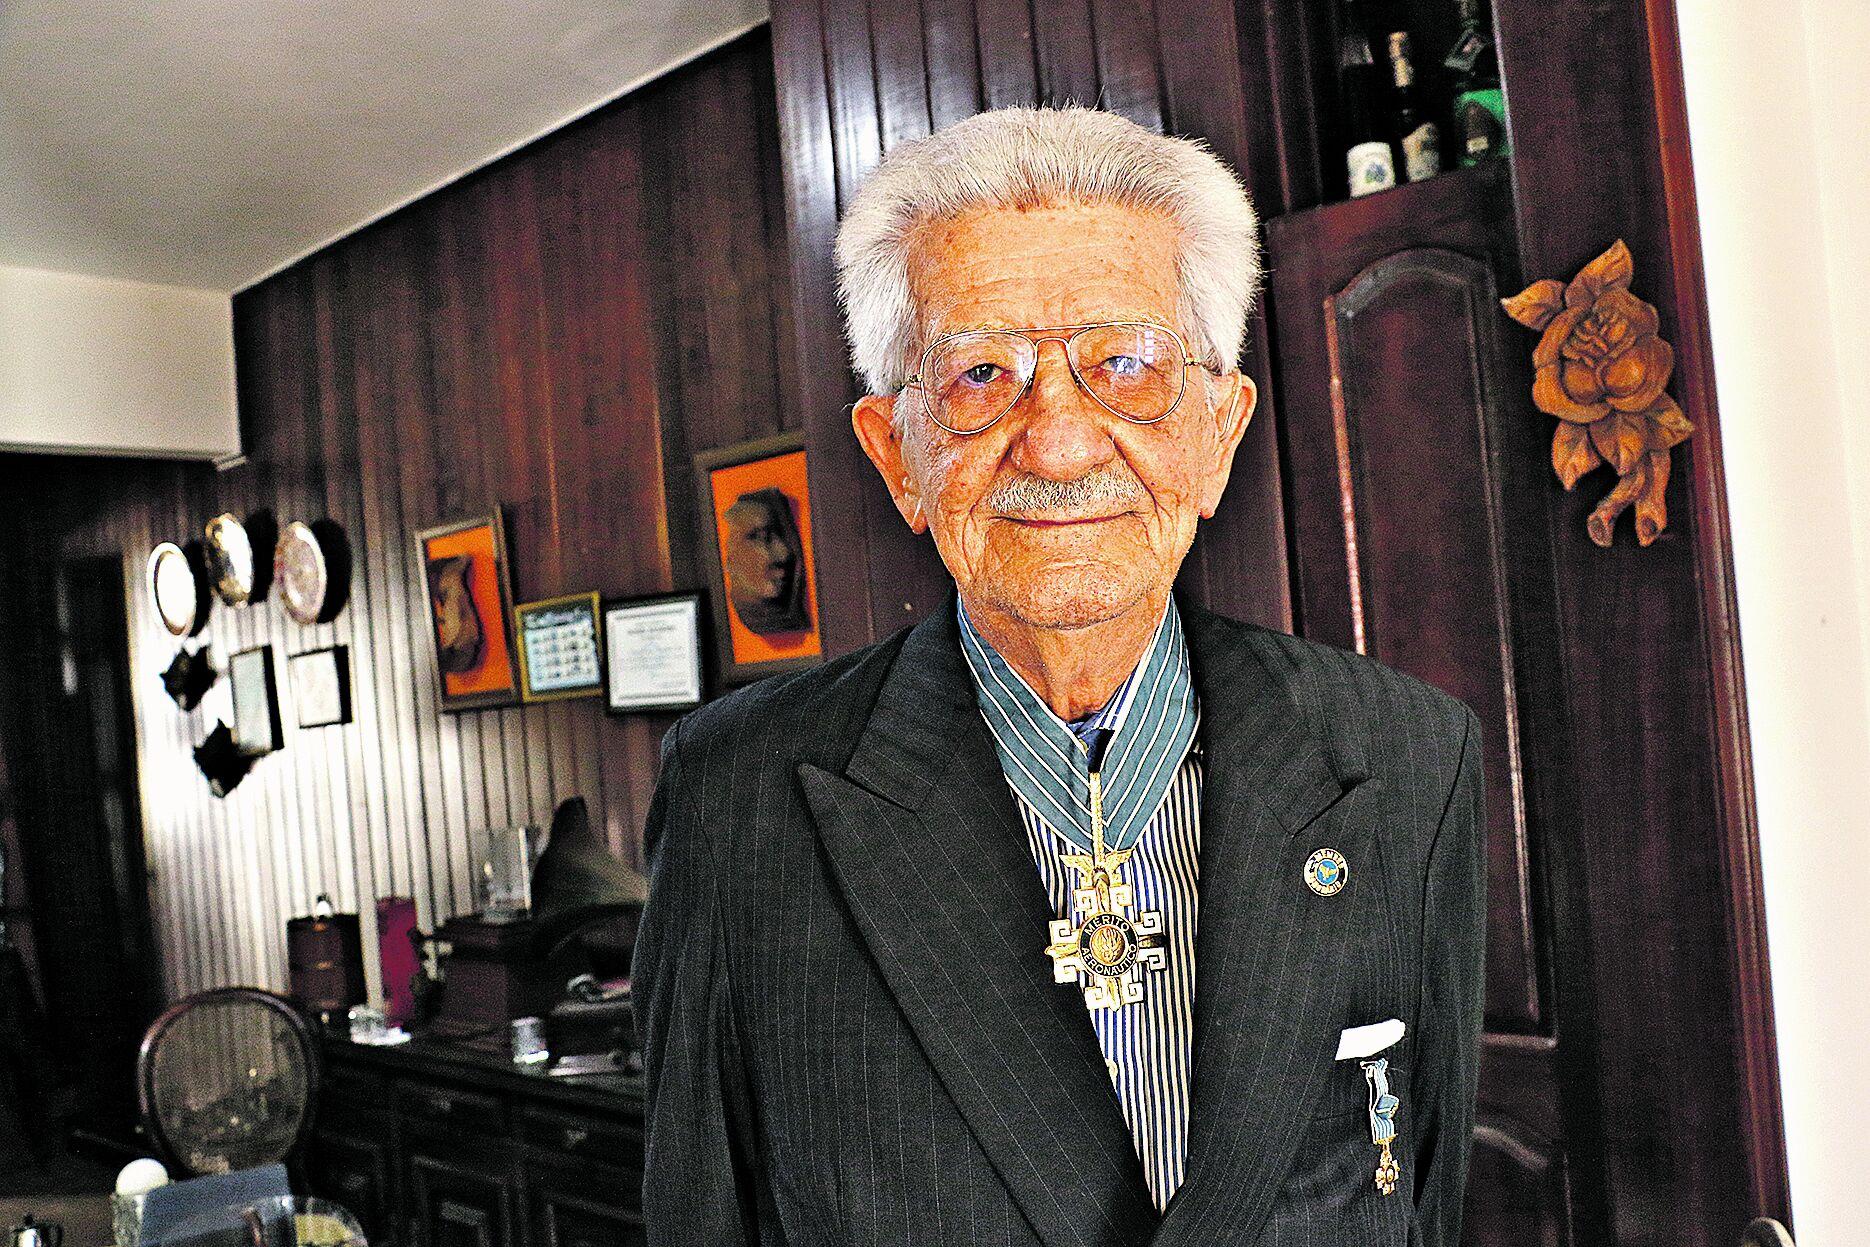 Bisneto de Júlio Cezar, Eurico Bentes Costa